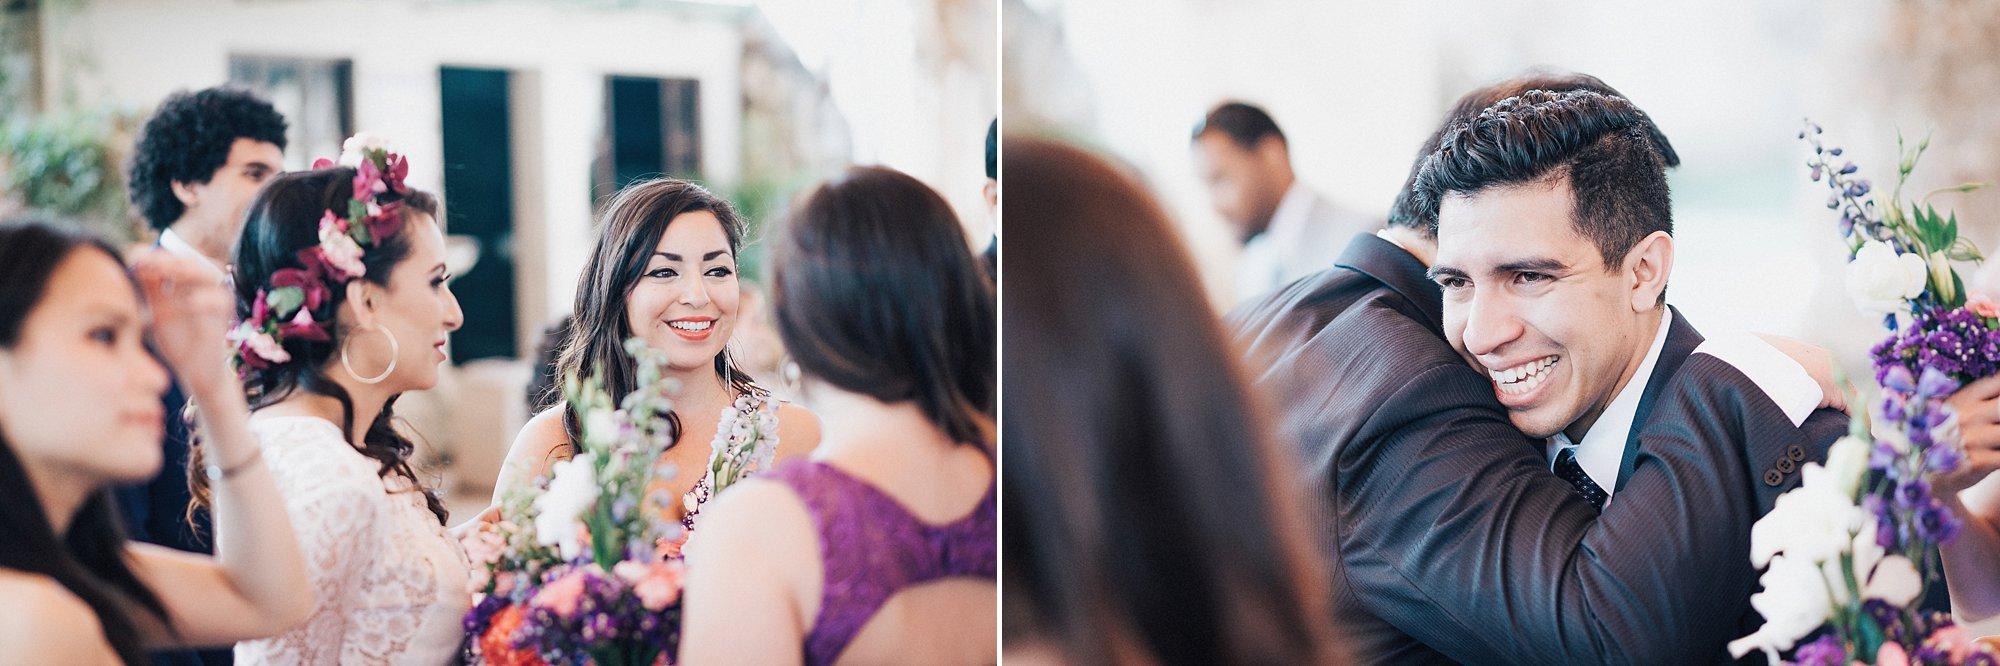 alex-yazmin-wedding-photographer-antigua-guatemala-090